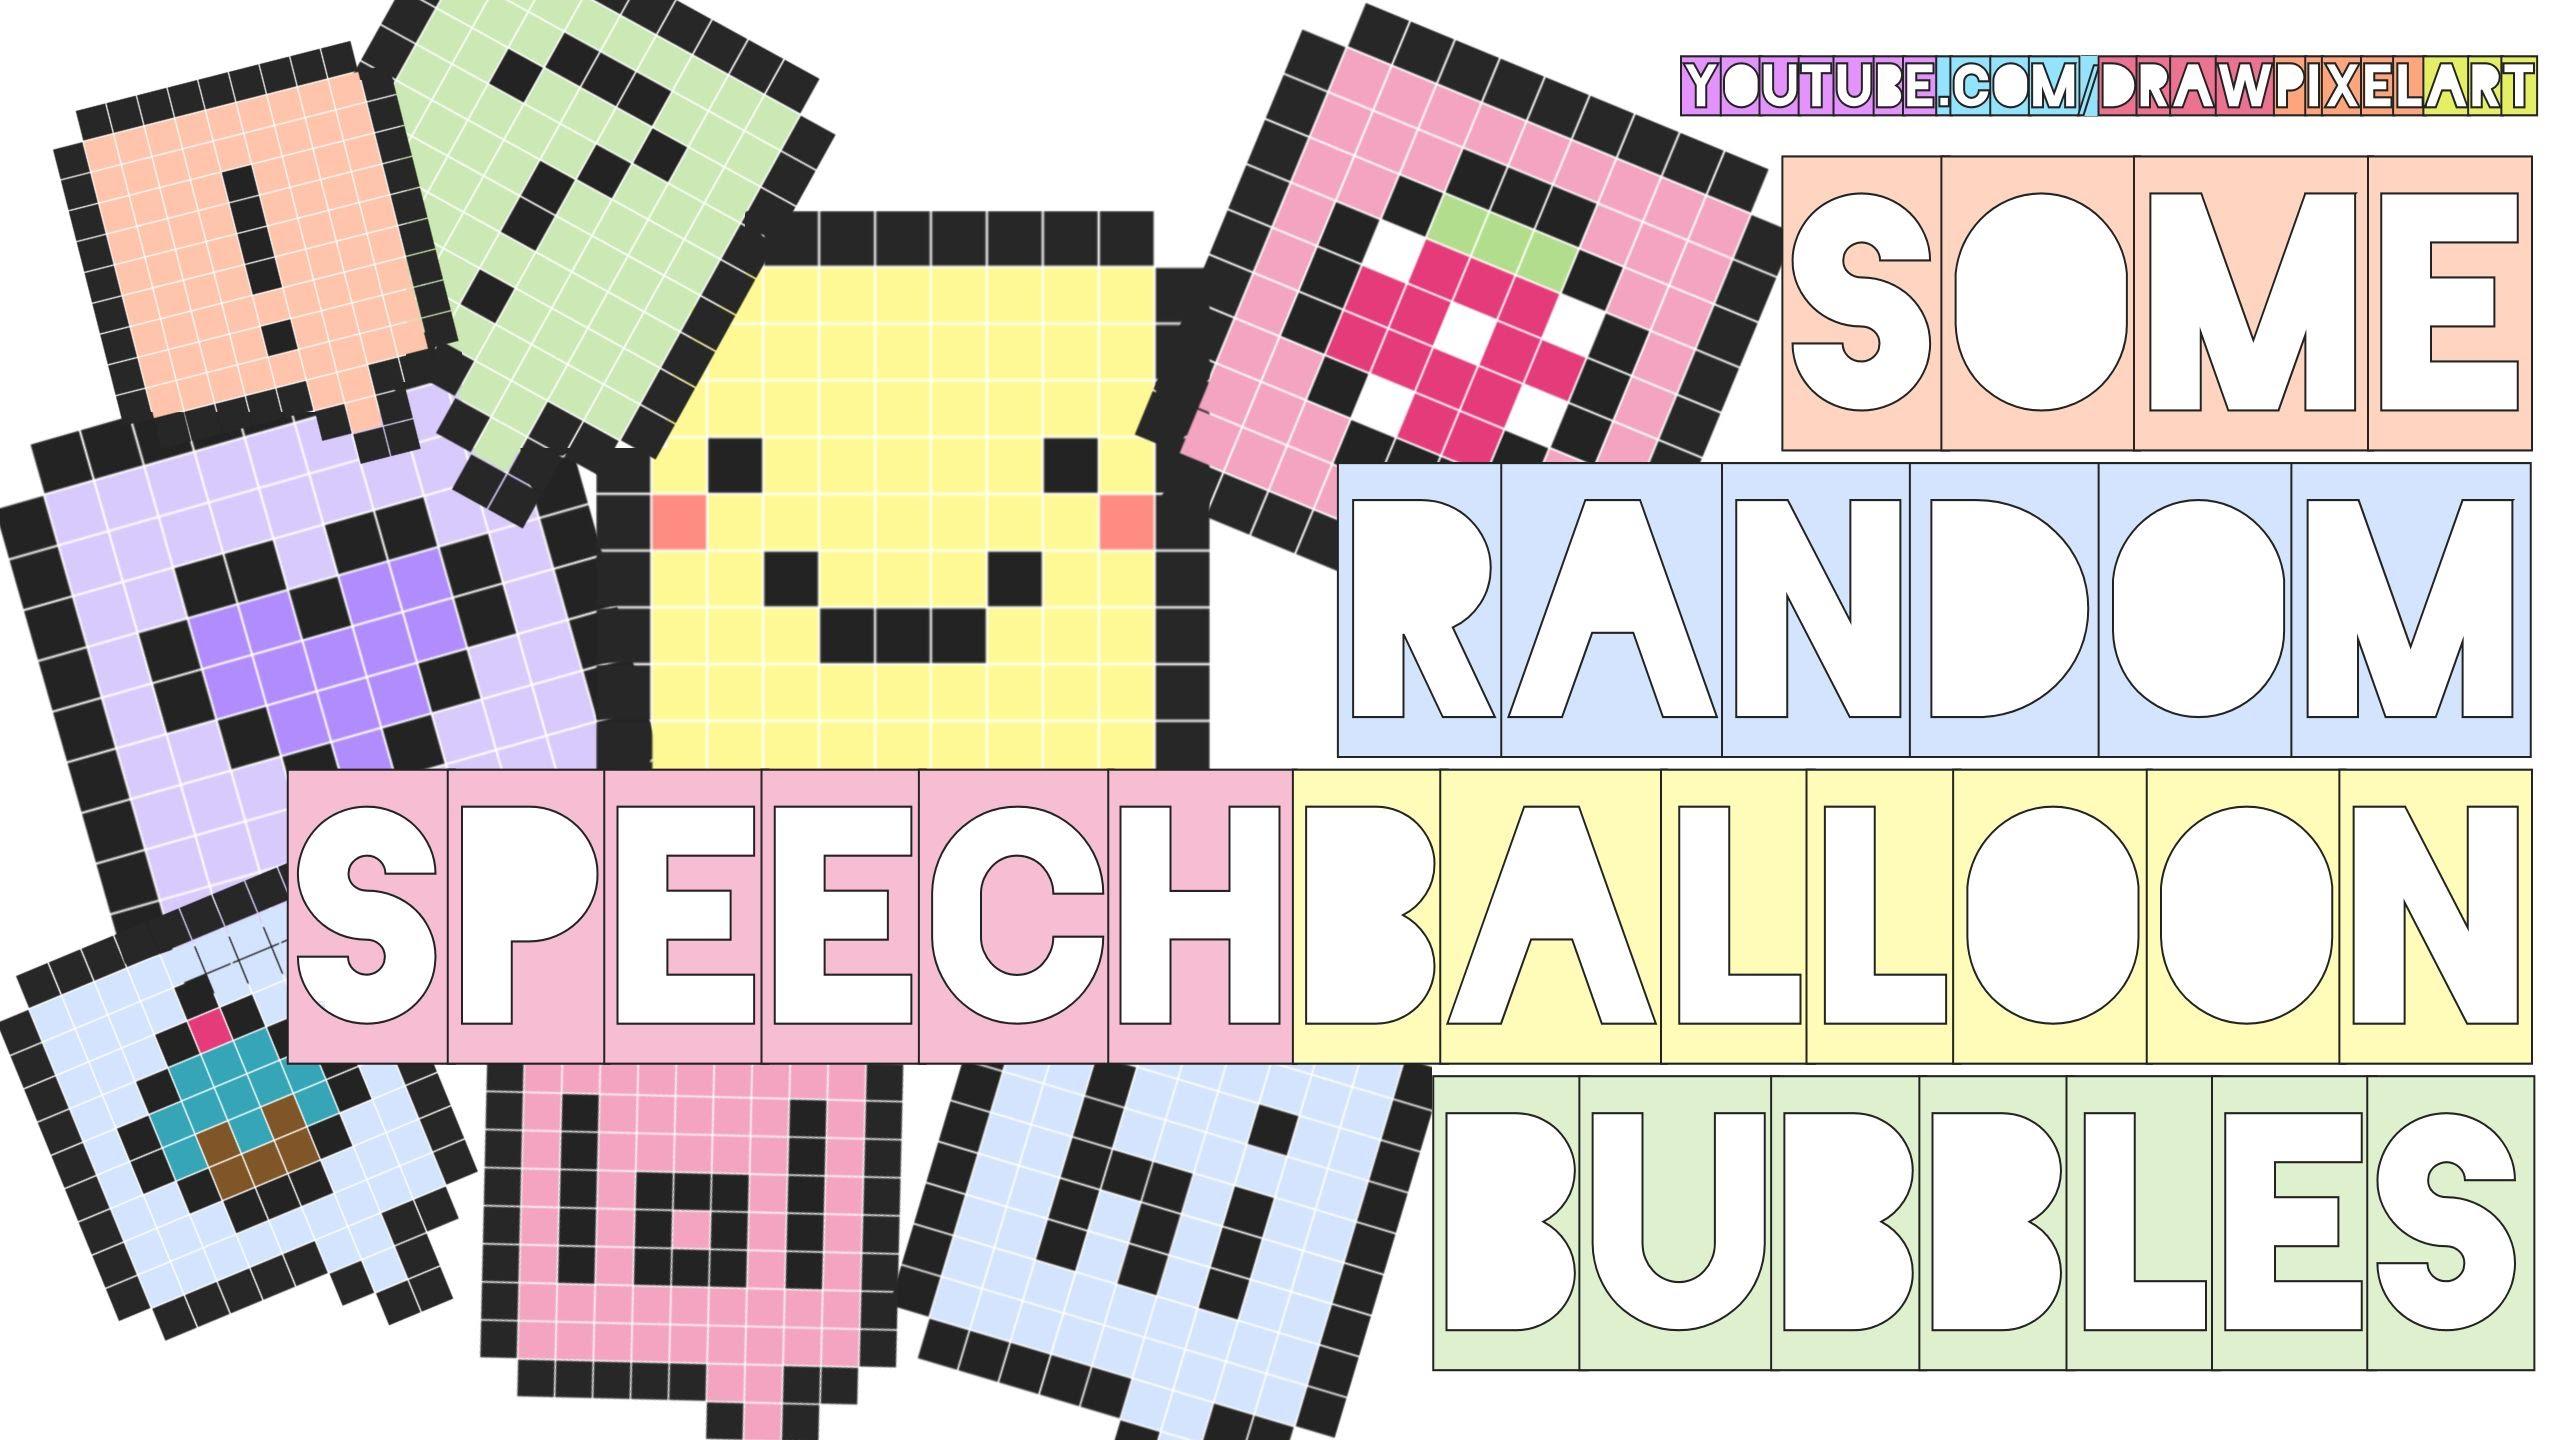 Drawn pixel art bubble Bubbles easy to random how